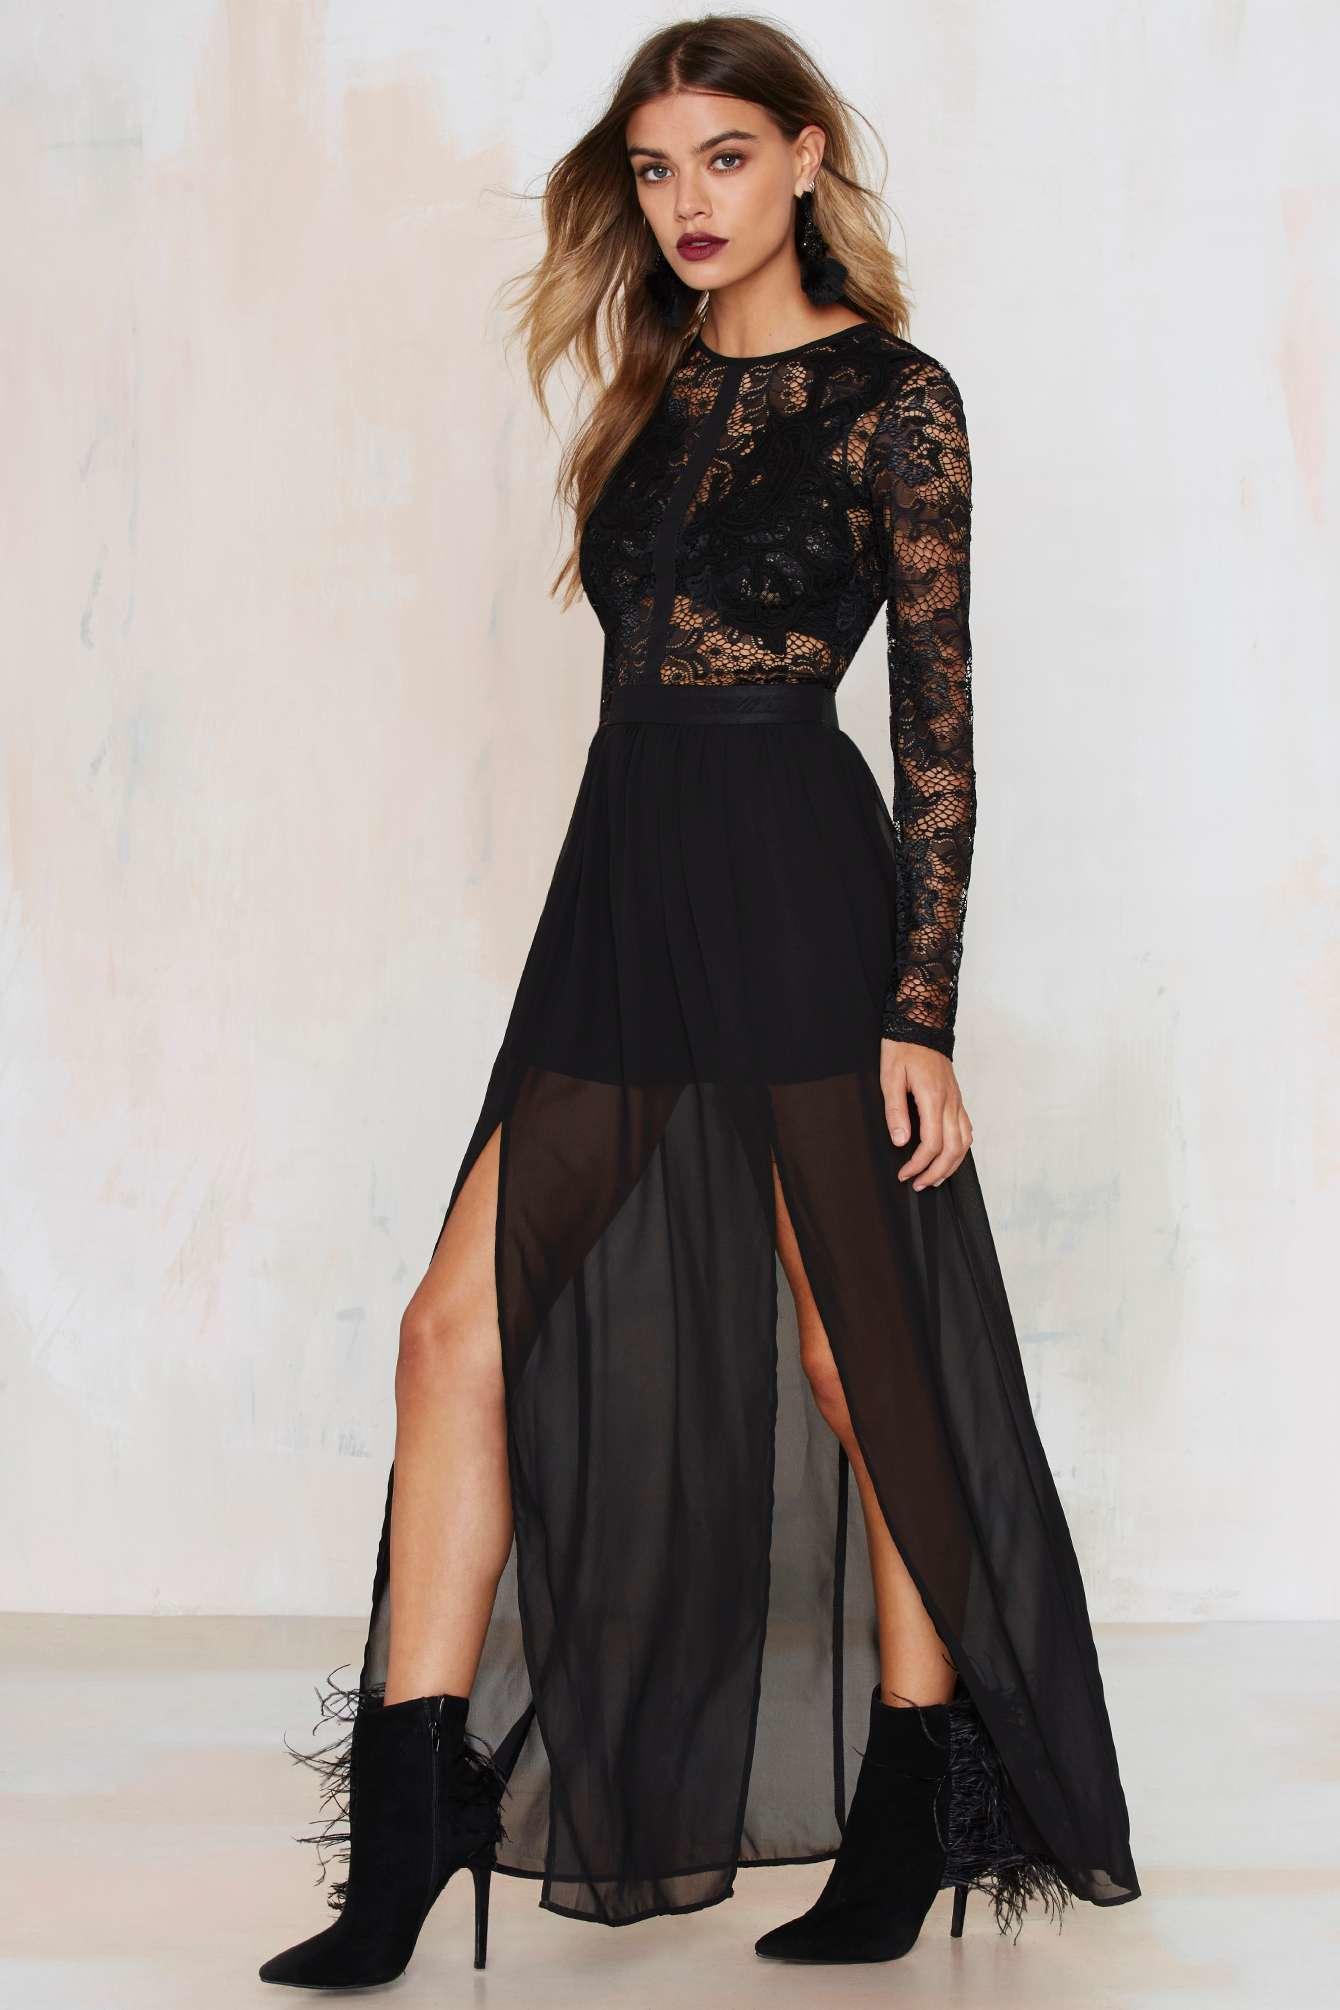 Lyst Nasty Gal Applique Mystique Lace Dress In Black